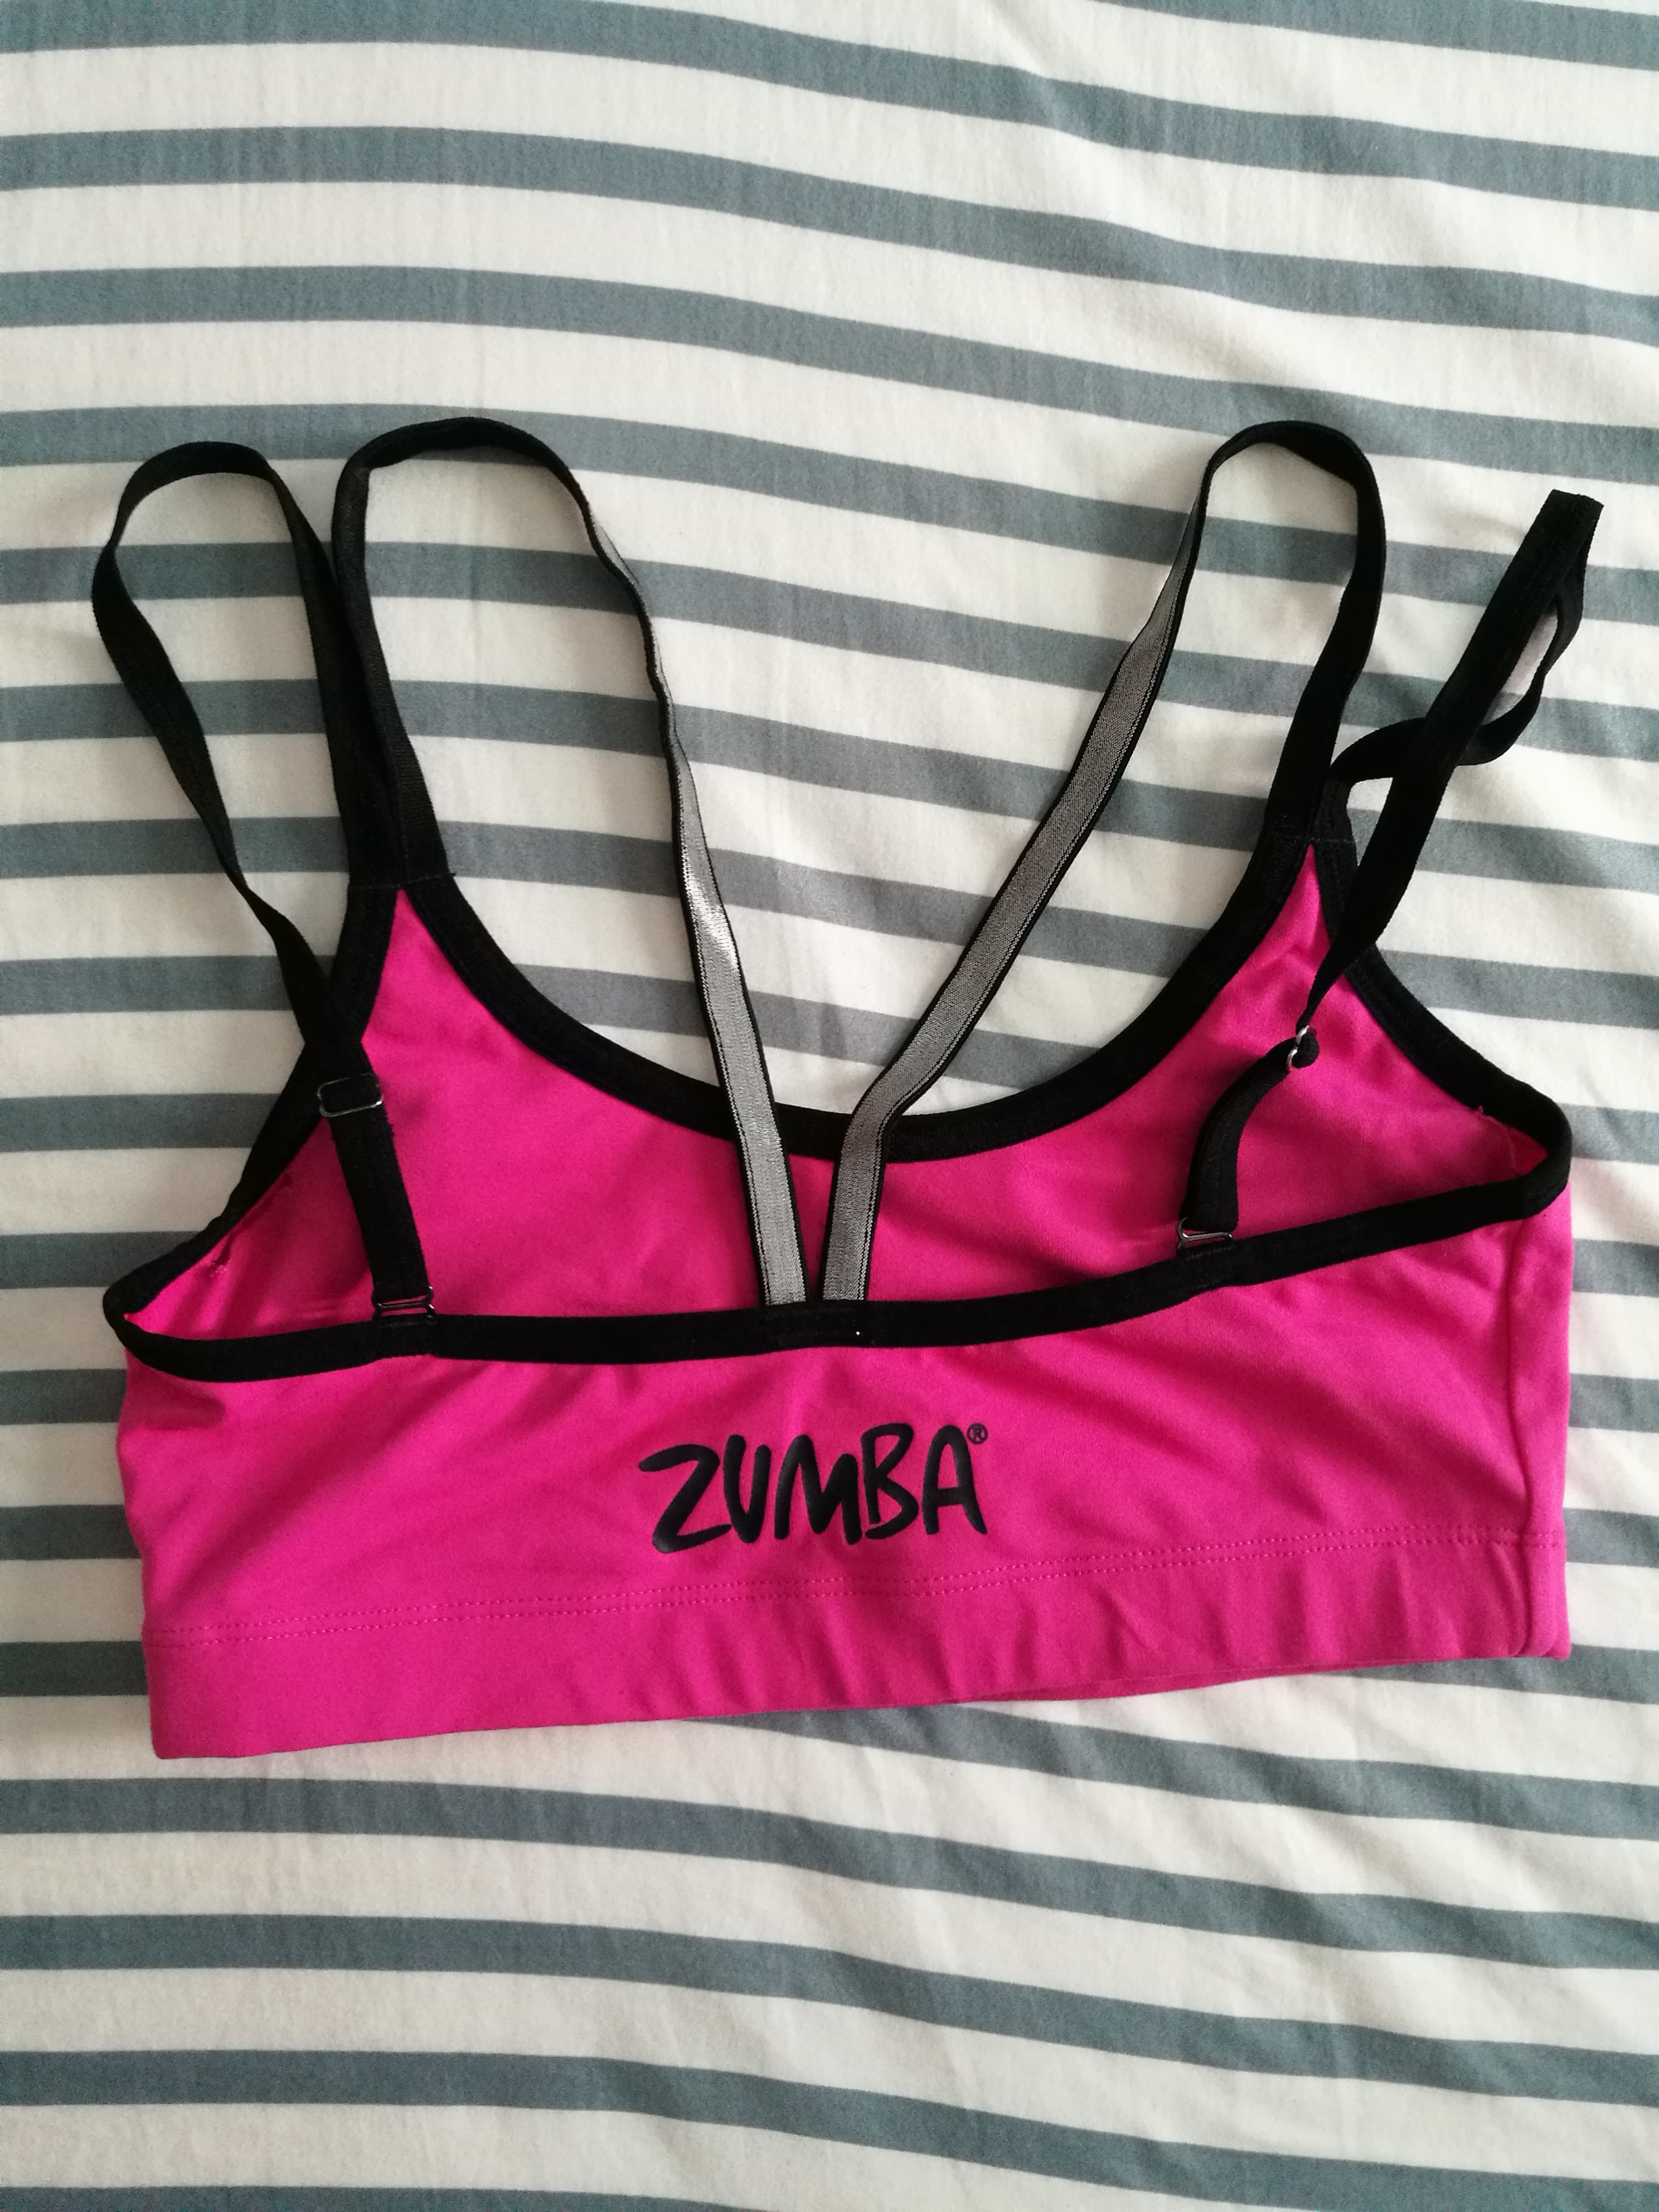 812fd79eb9450 Zumba cropped top sports bra size M